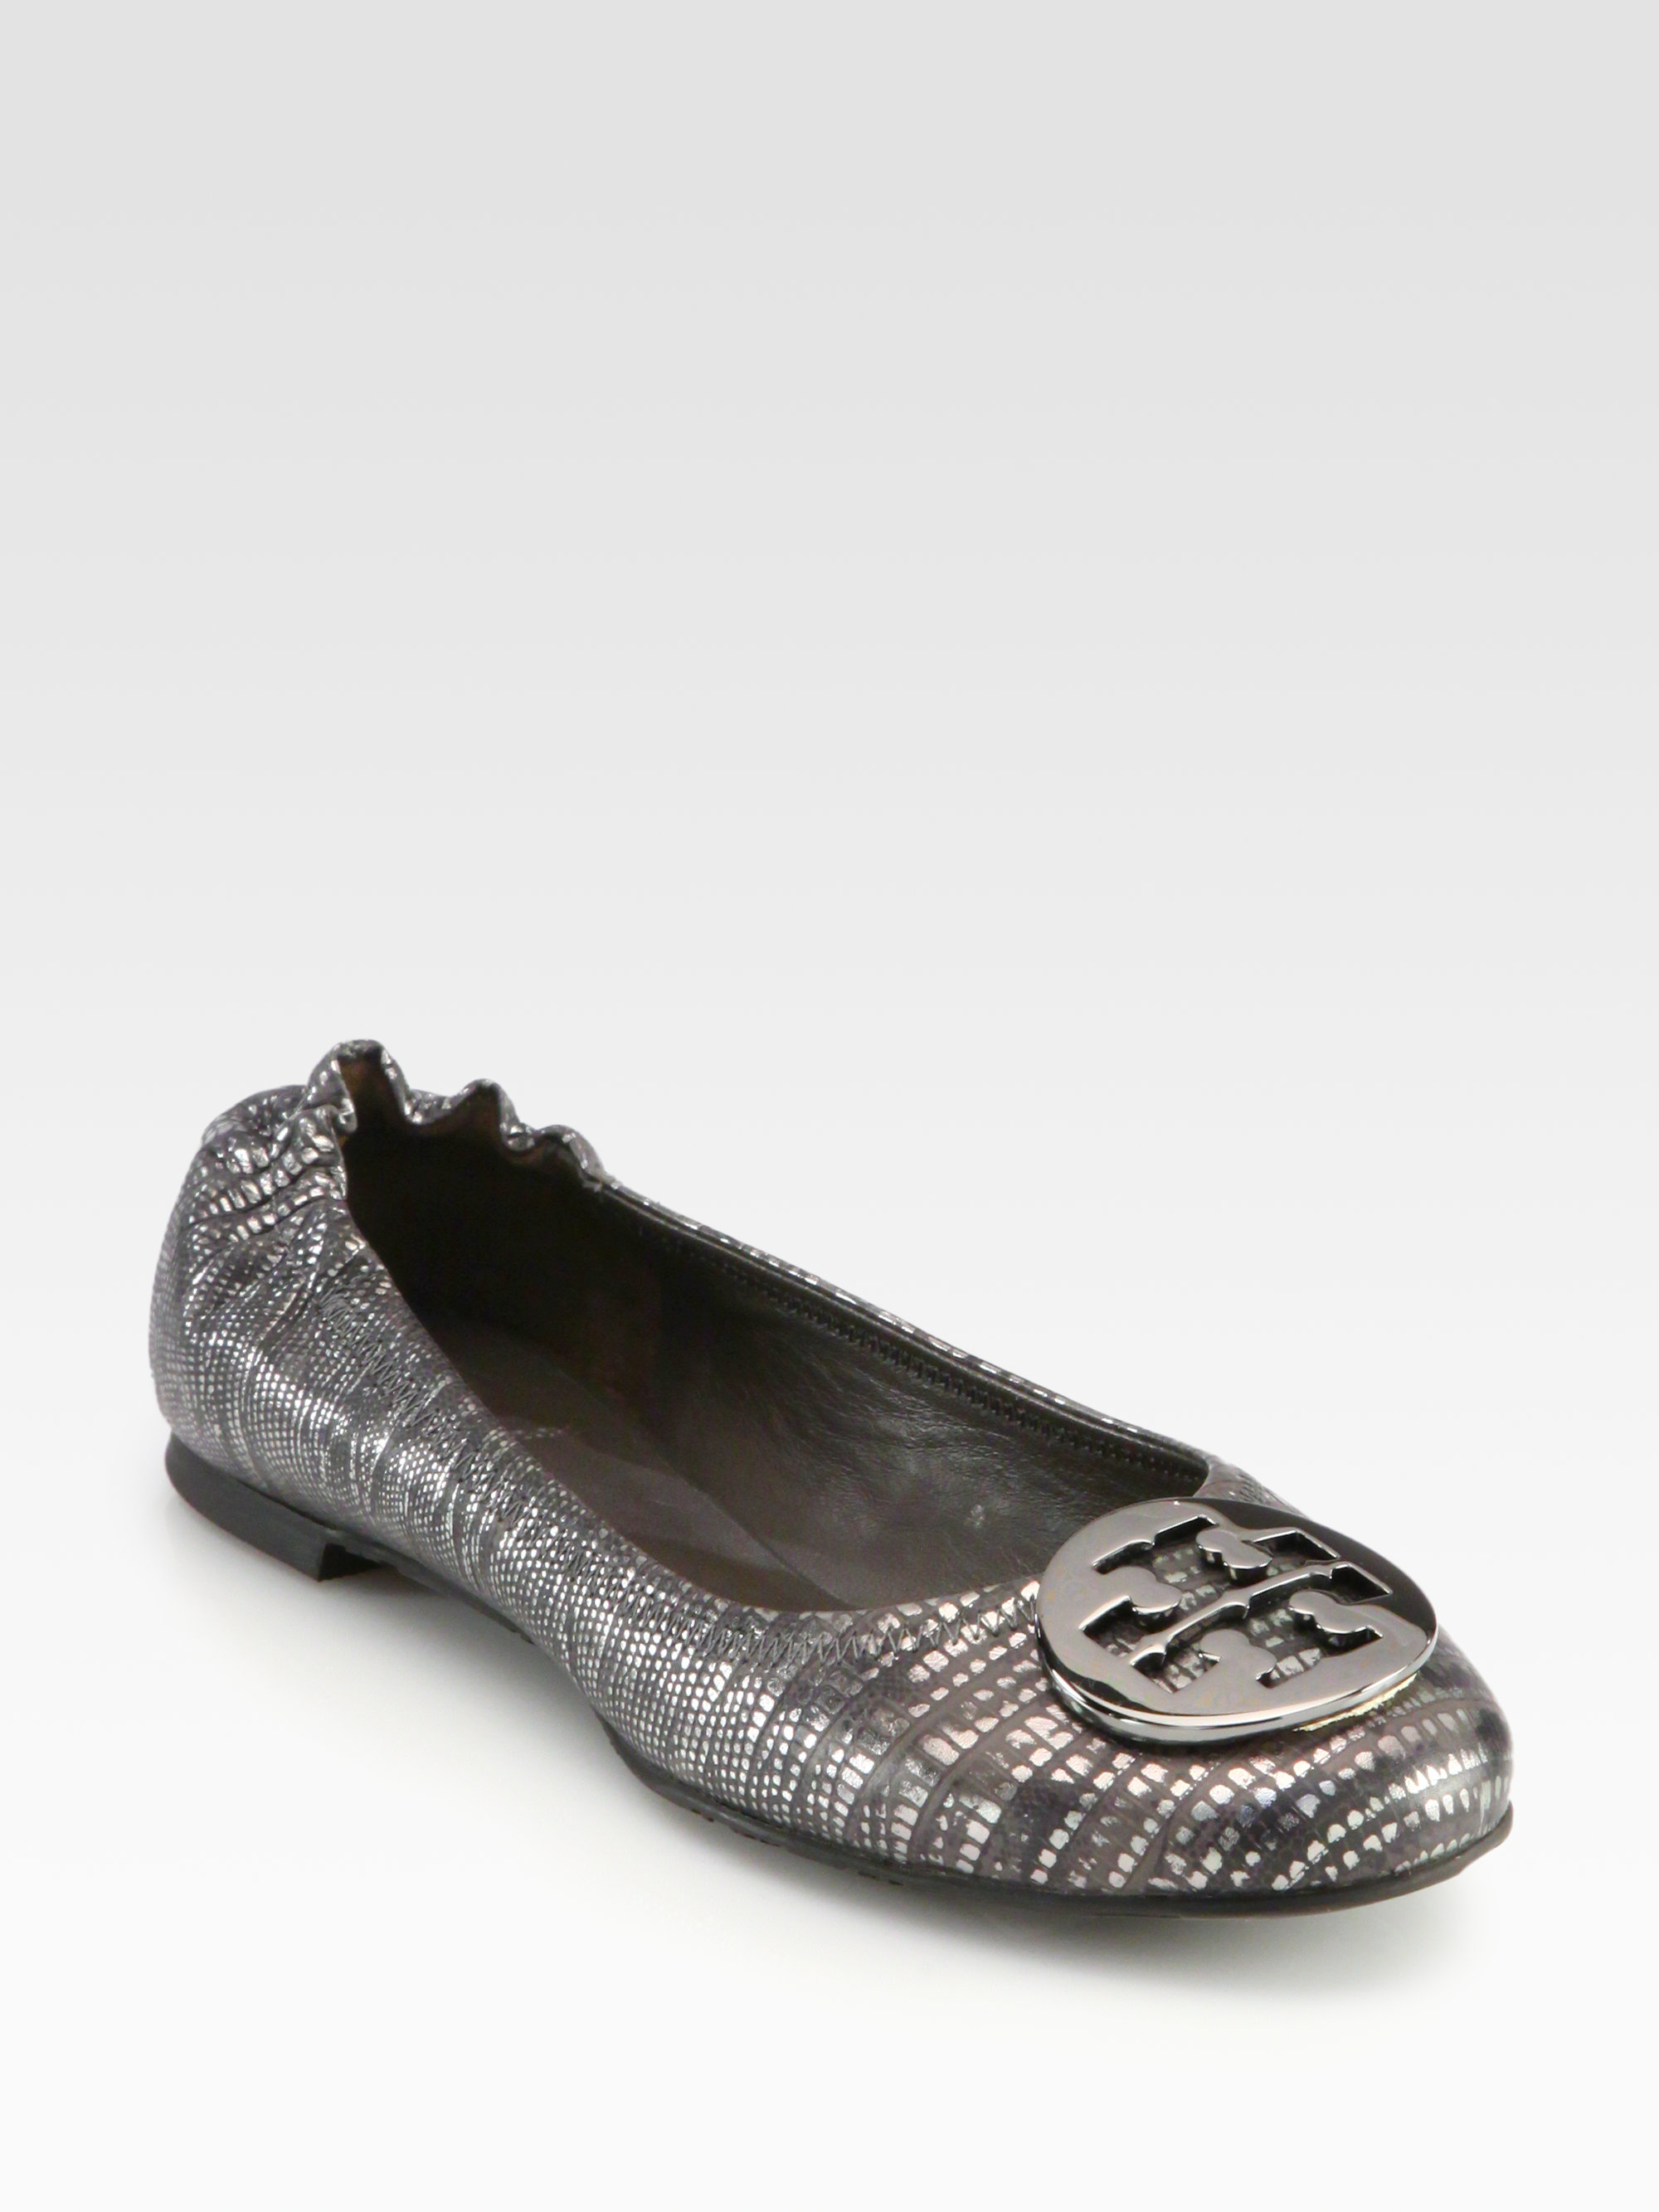 6a586a728 ... wholesale lyst tory burch reva snakeprint metallic leather ballet flats  in a5d1c 746c1